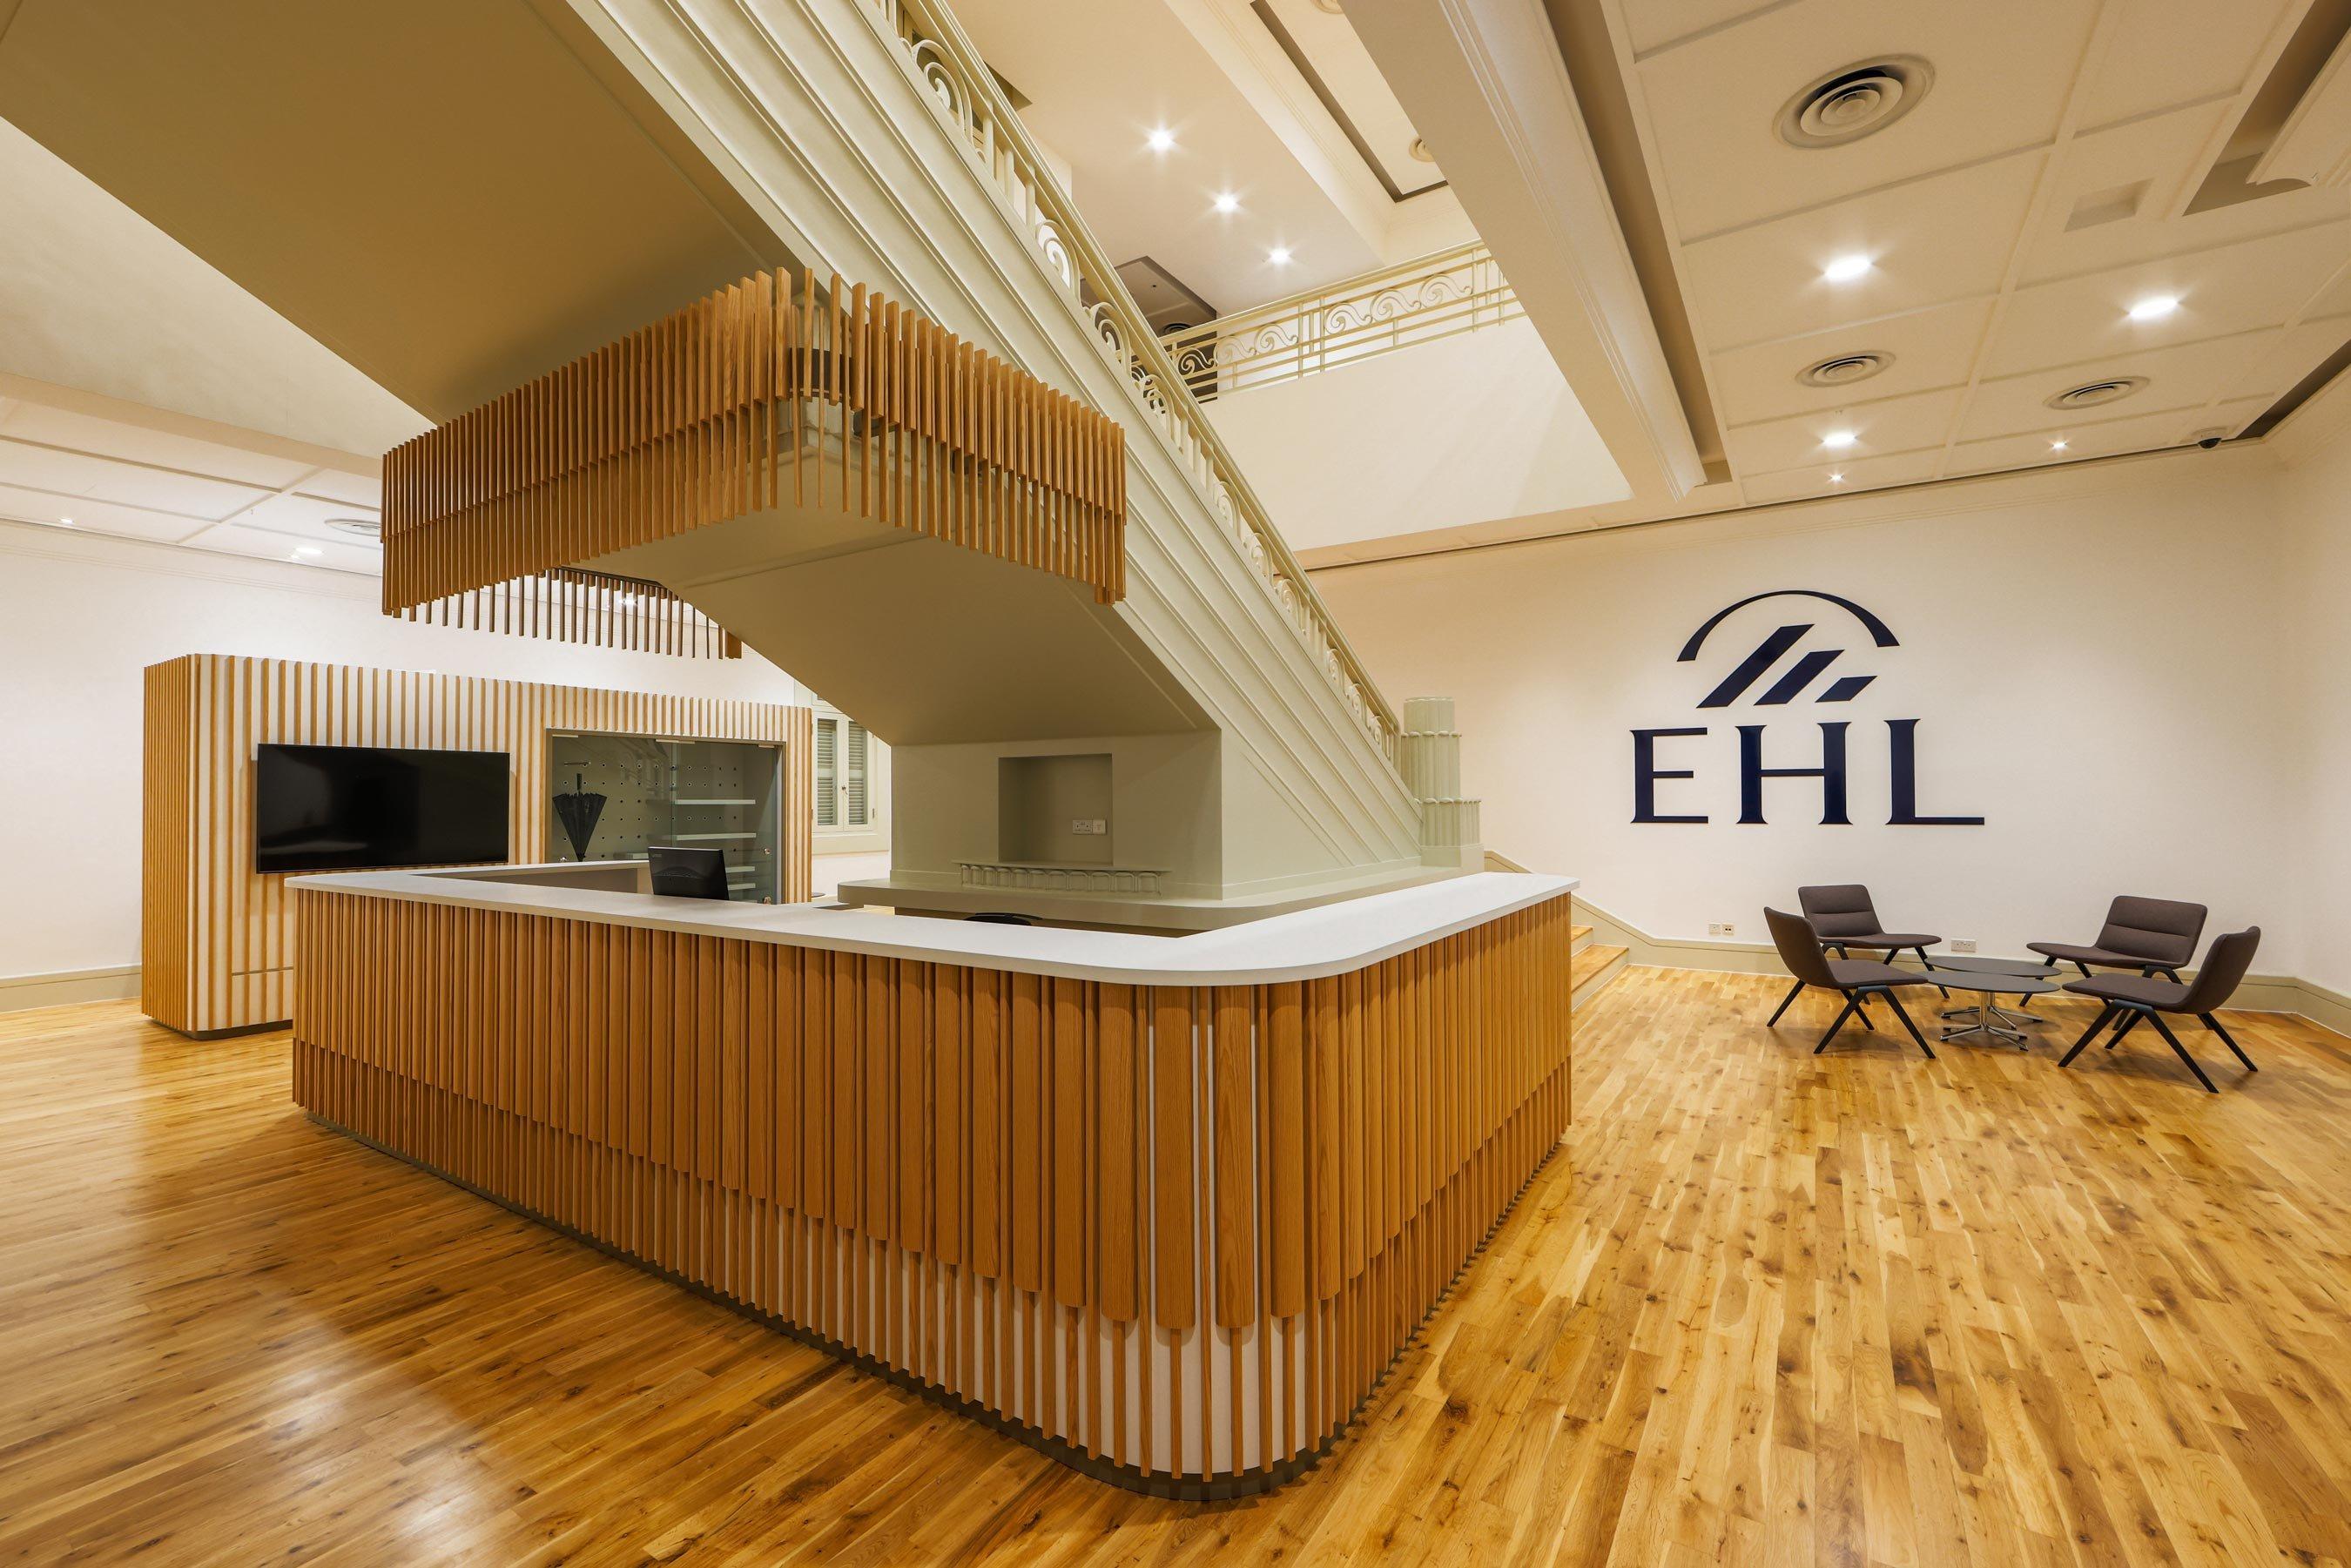 ehl-singapore-reception